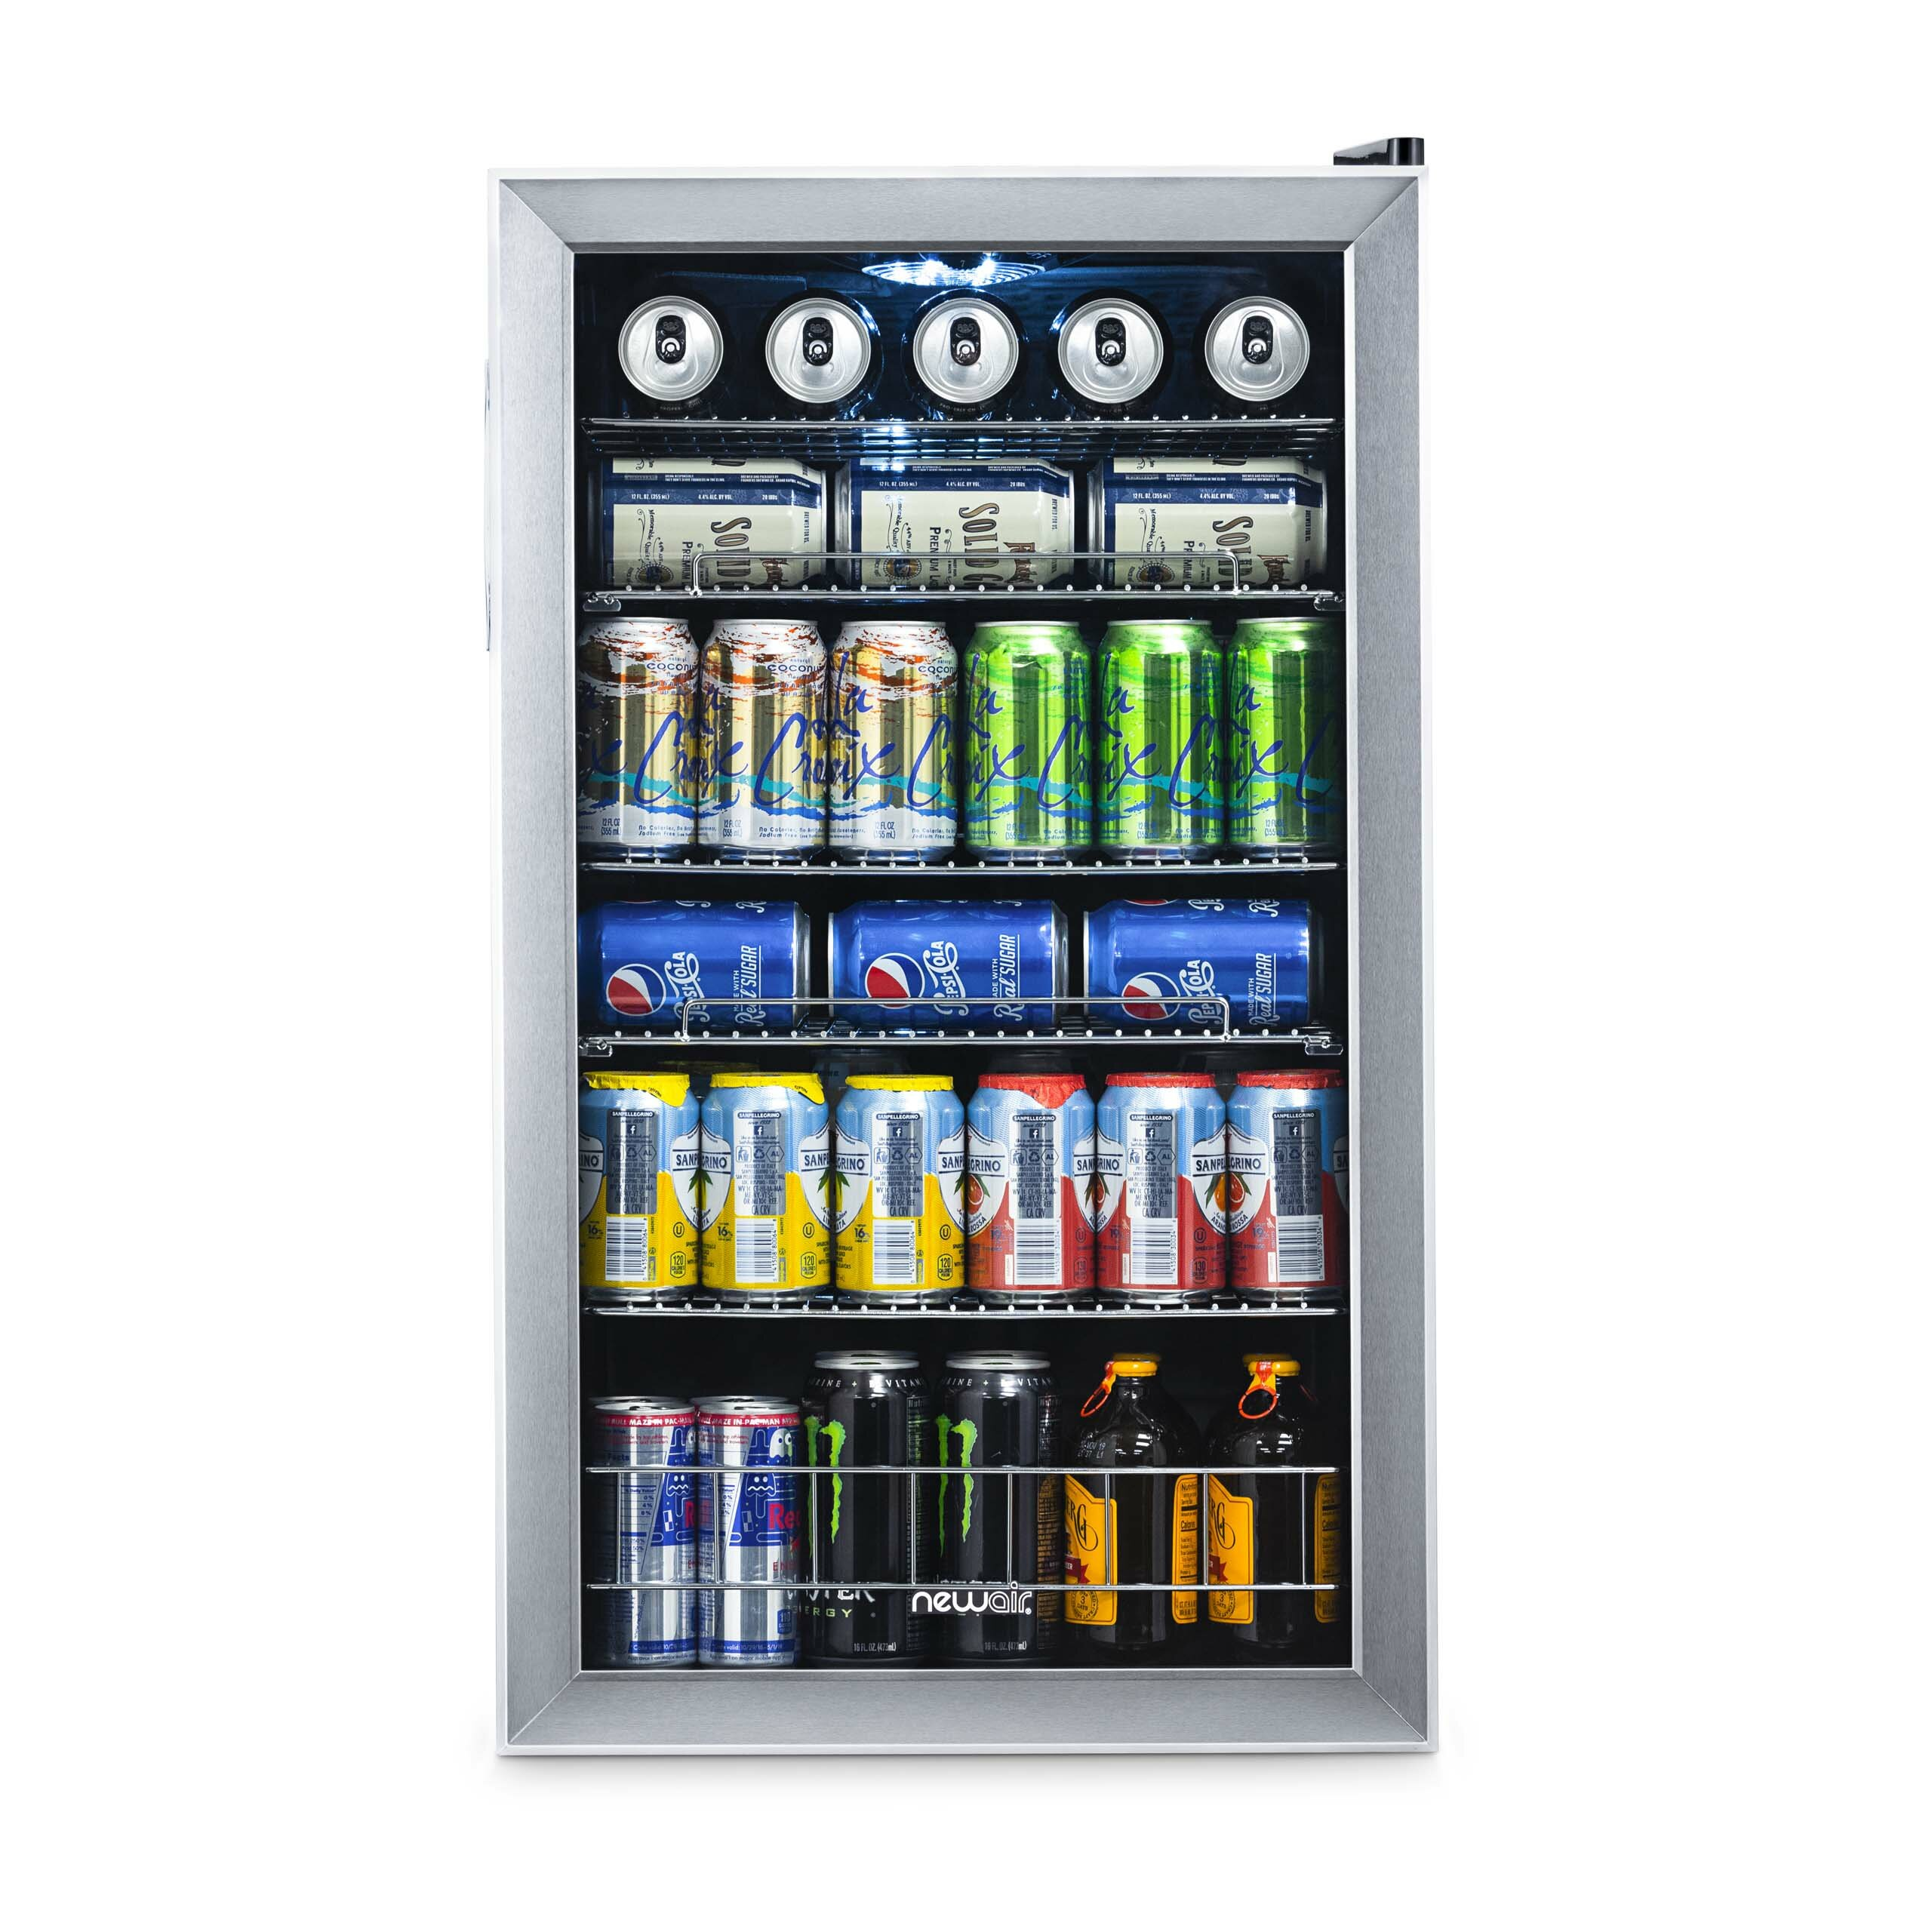 Newair 126 Can Freestanding Beverage Refrigerator Reviews Wayfair